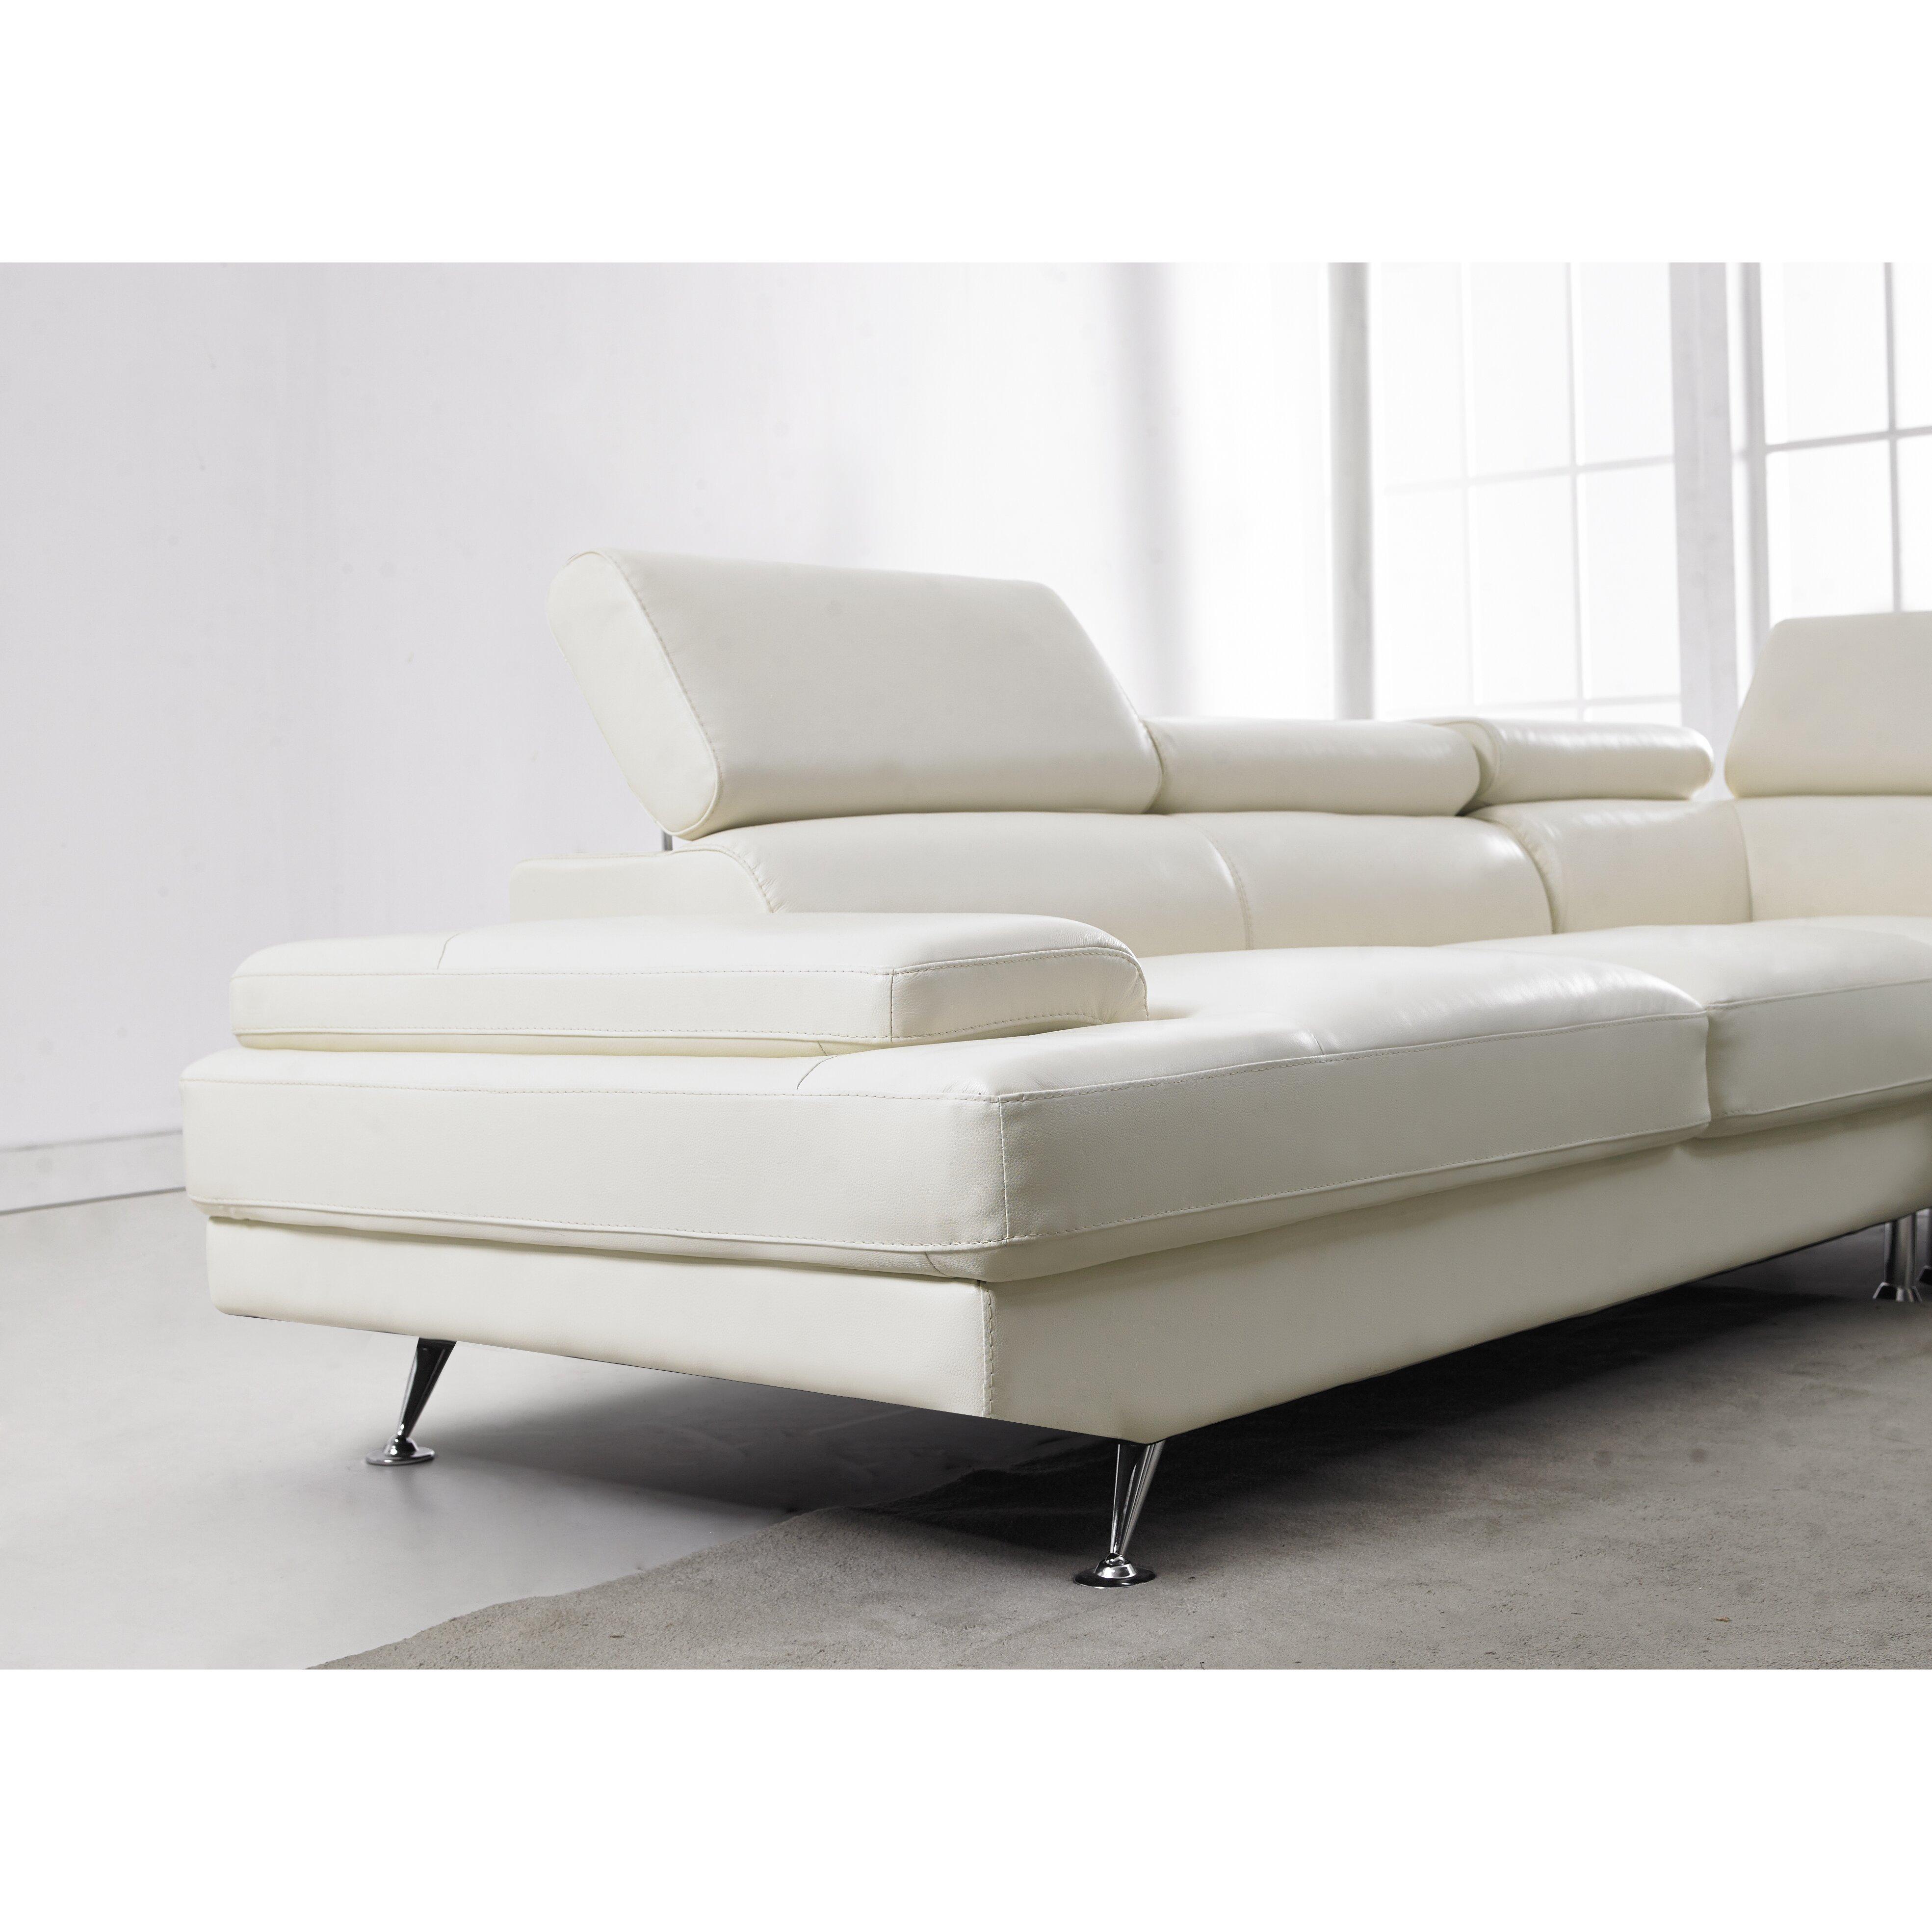 Daviddivanidesigns leather sectional wayfair for White sectional sofa wayfair